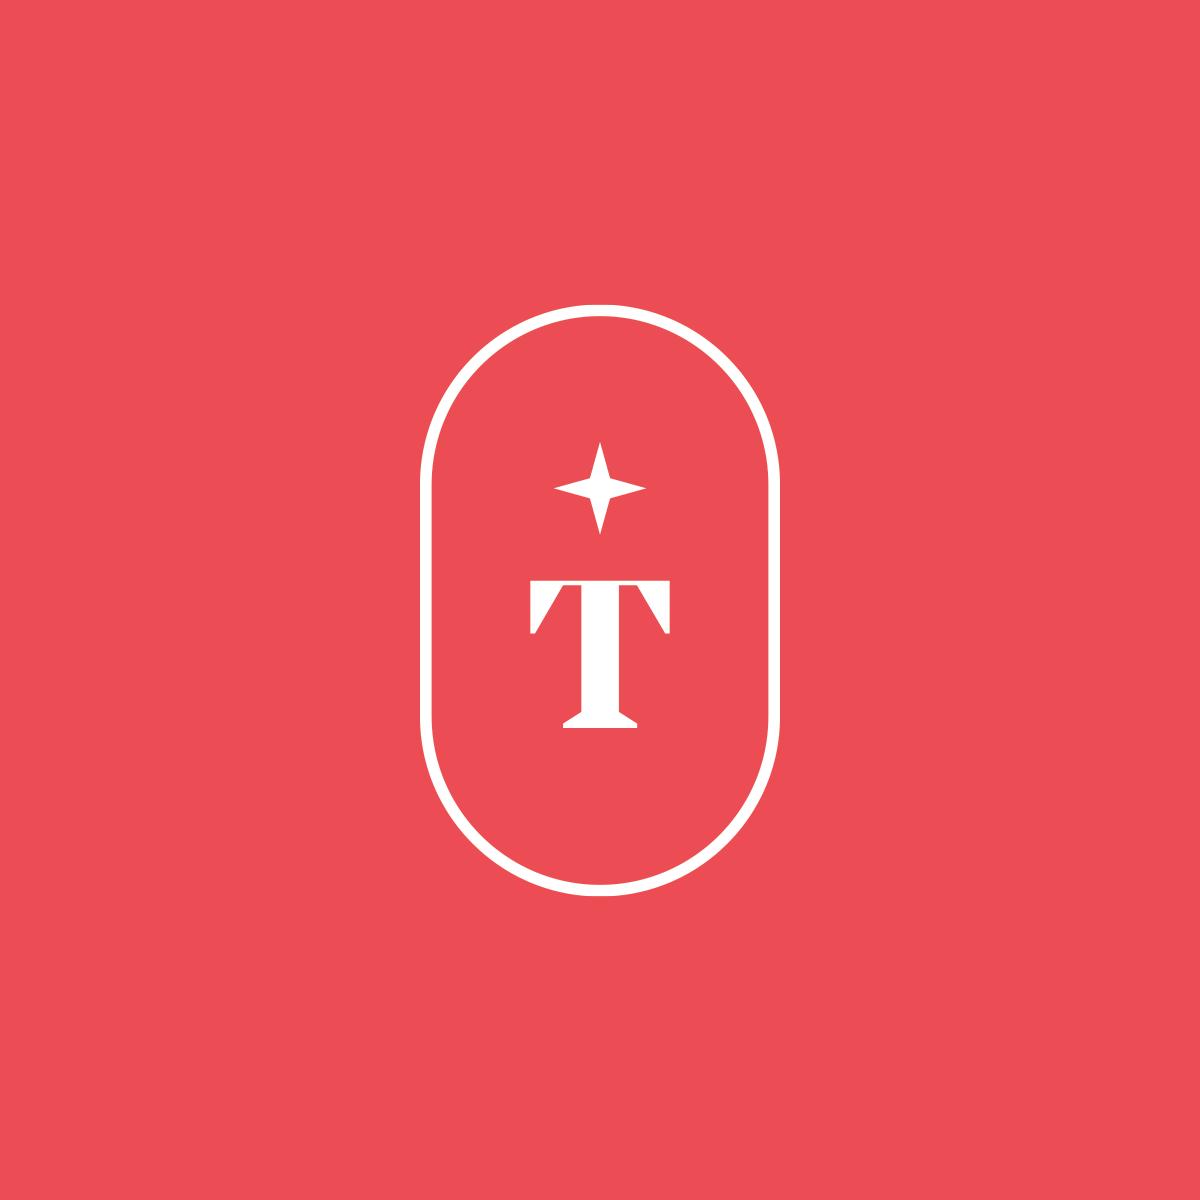 TDZ Creative Partners brand design by Pace Creative Design Studio